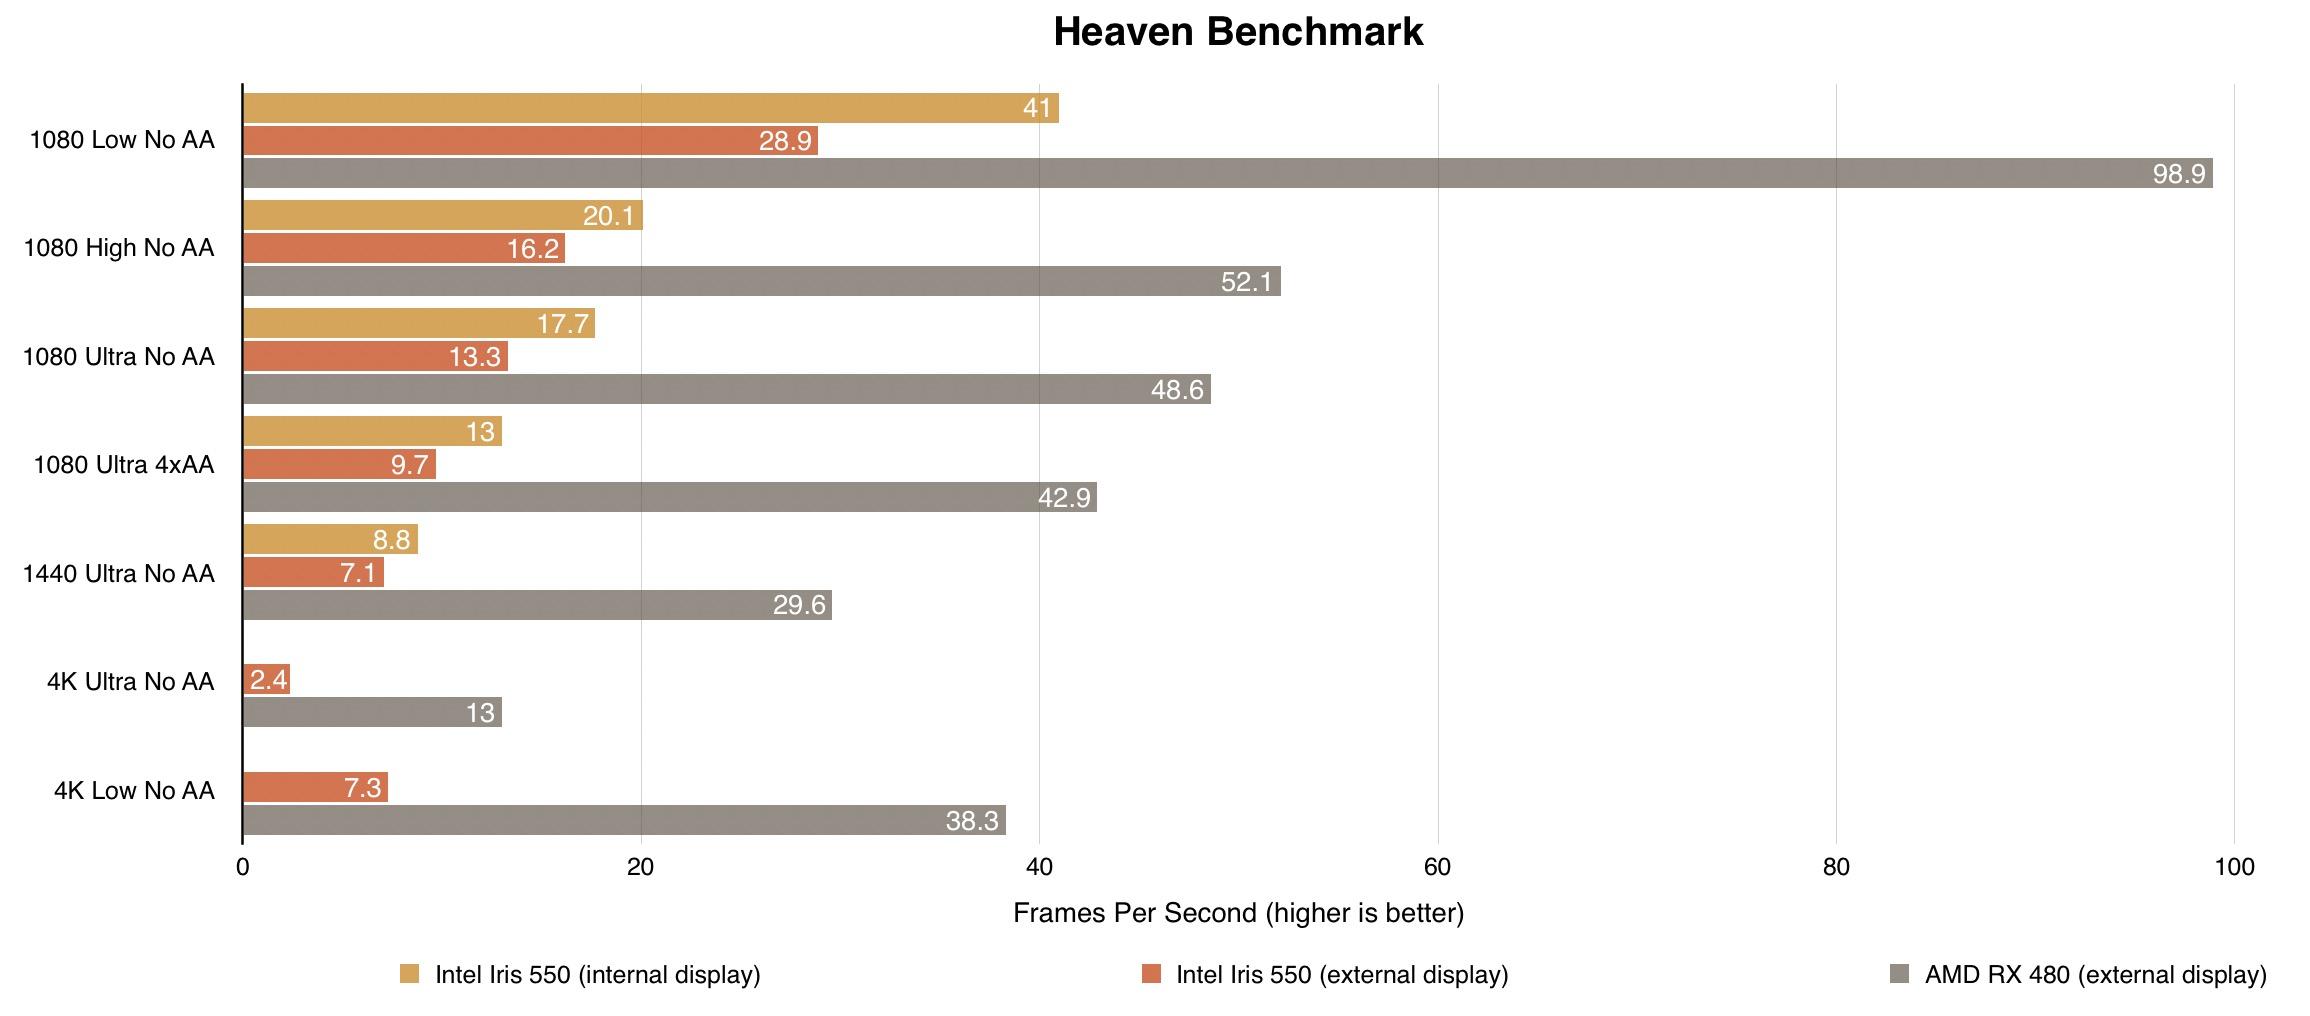 heaven-benchmark-egpu-macbook-pro